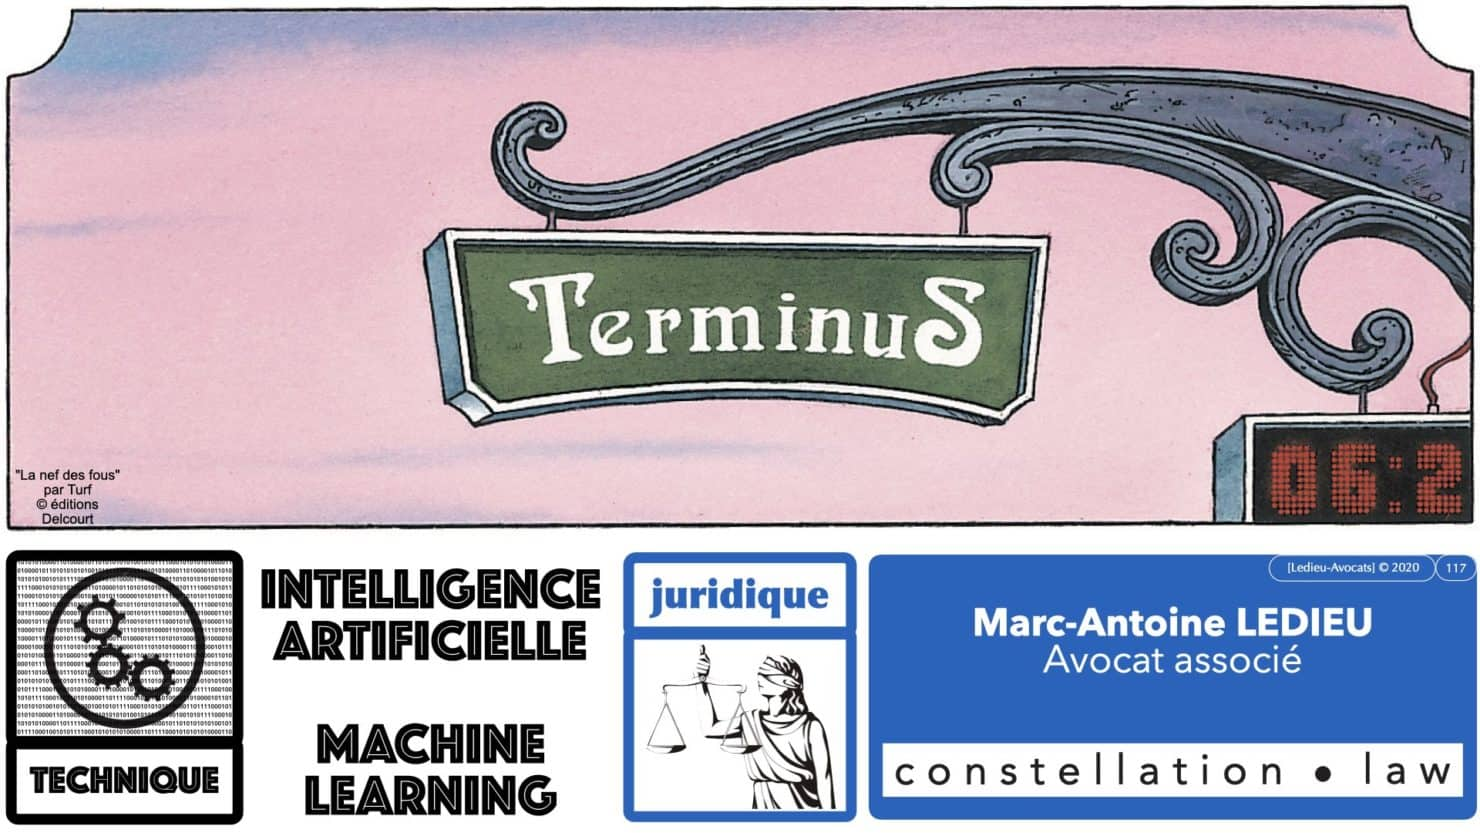 307 Intelligence artificielle-machine-learning-deep-learning-base de données-BIG-DATA *16:9* Constellation ©Ledieu-Avocat-13-10-2020.117